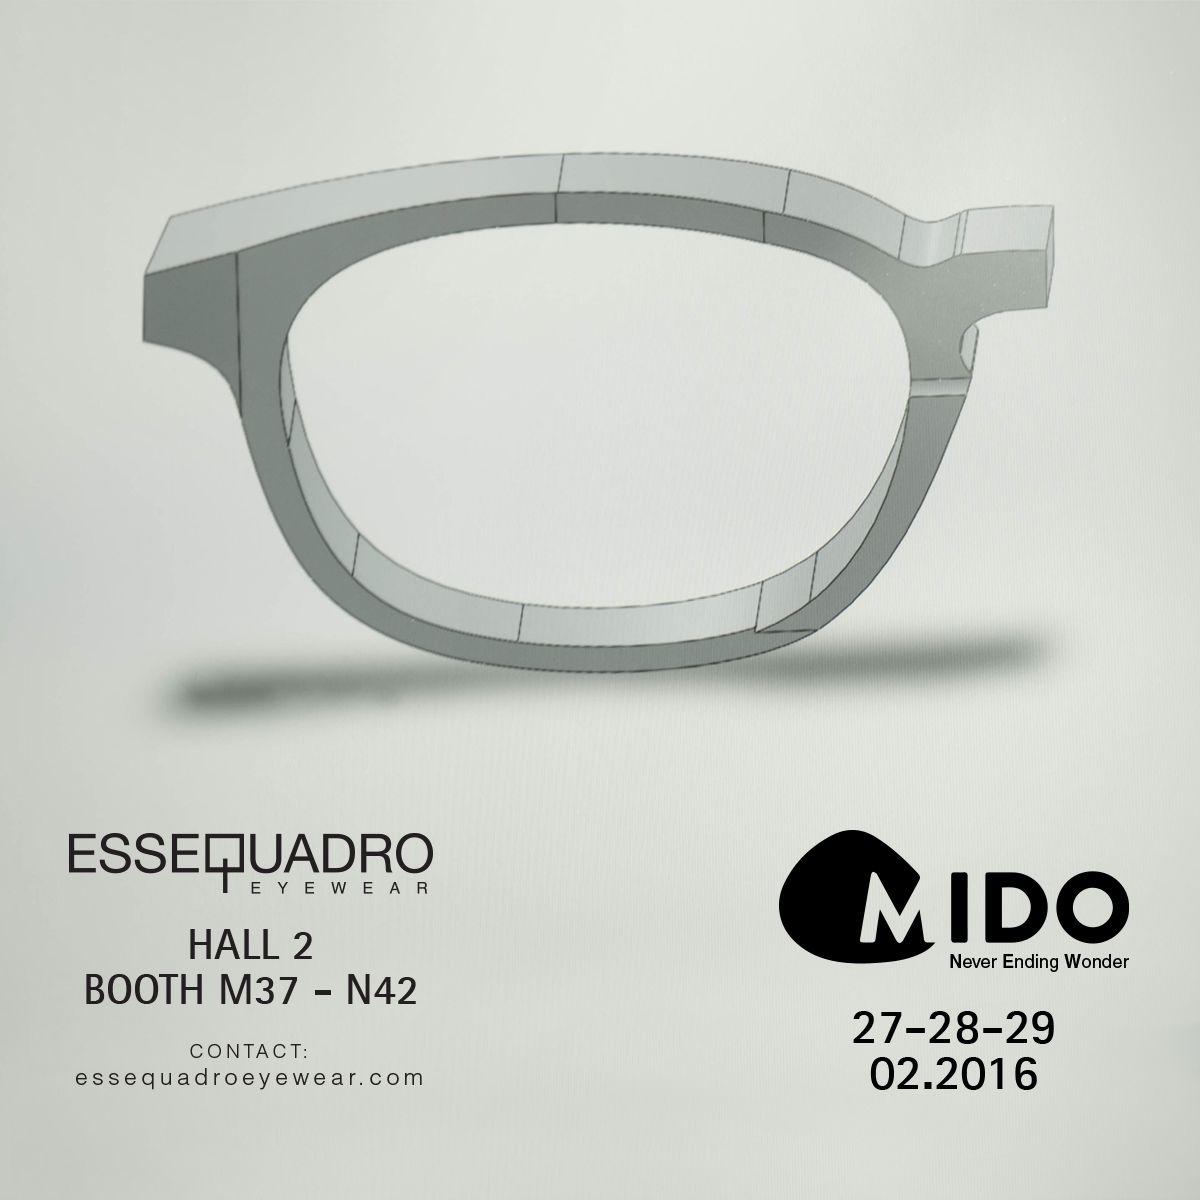 3f357beeb48 MIDO 2016  mido  essequadro  essequadroeyewear  eyewear  sunglasses  factory   handmade